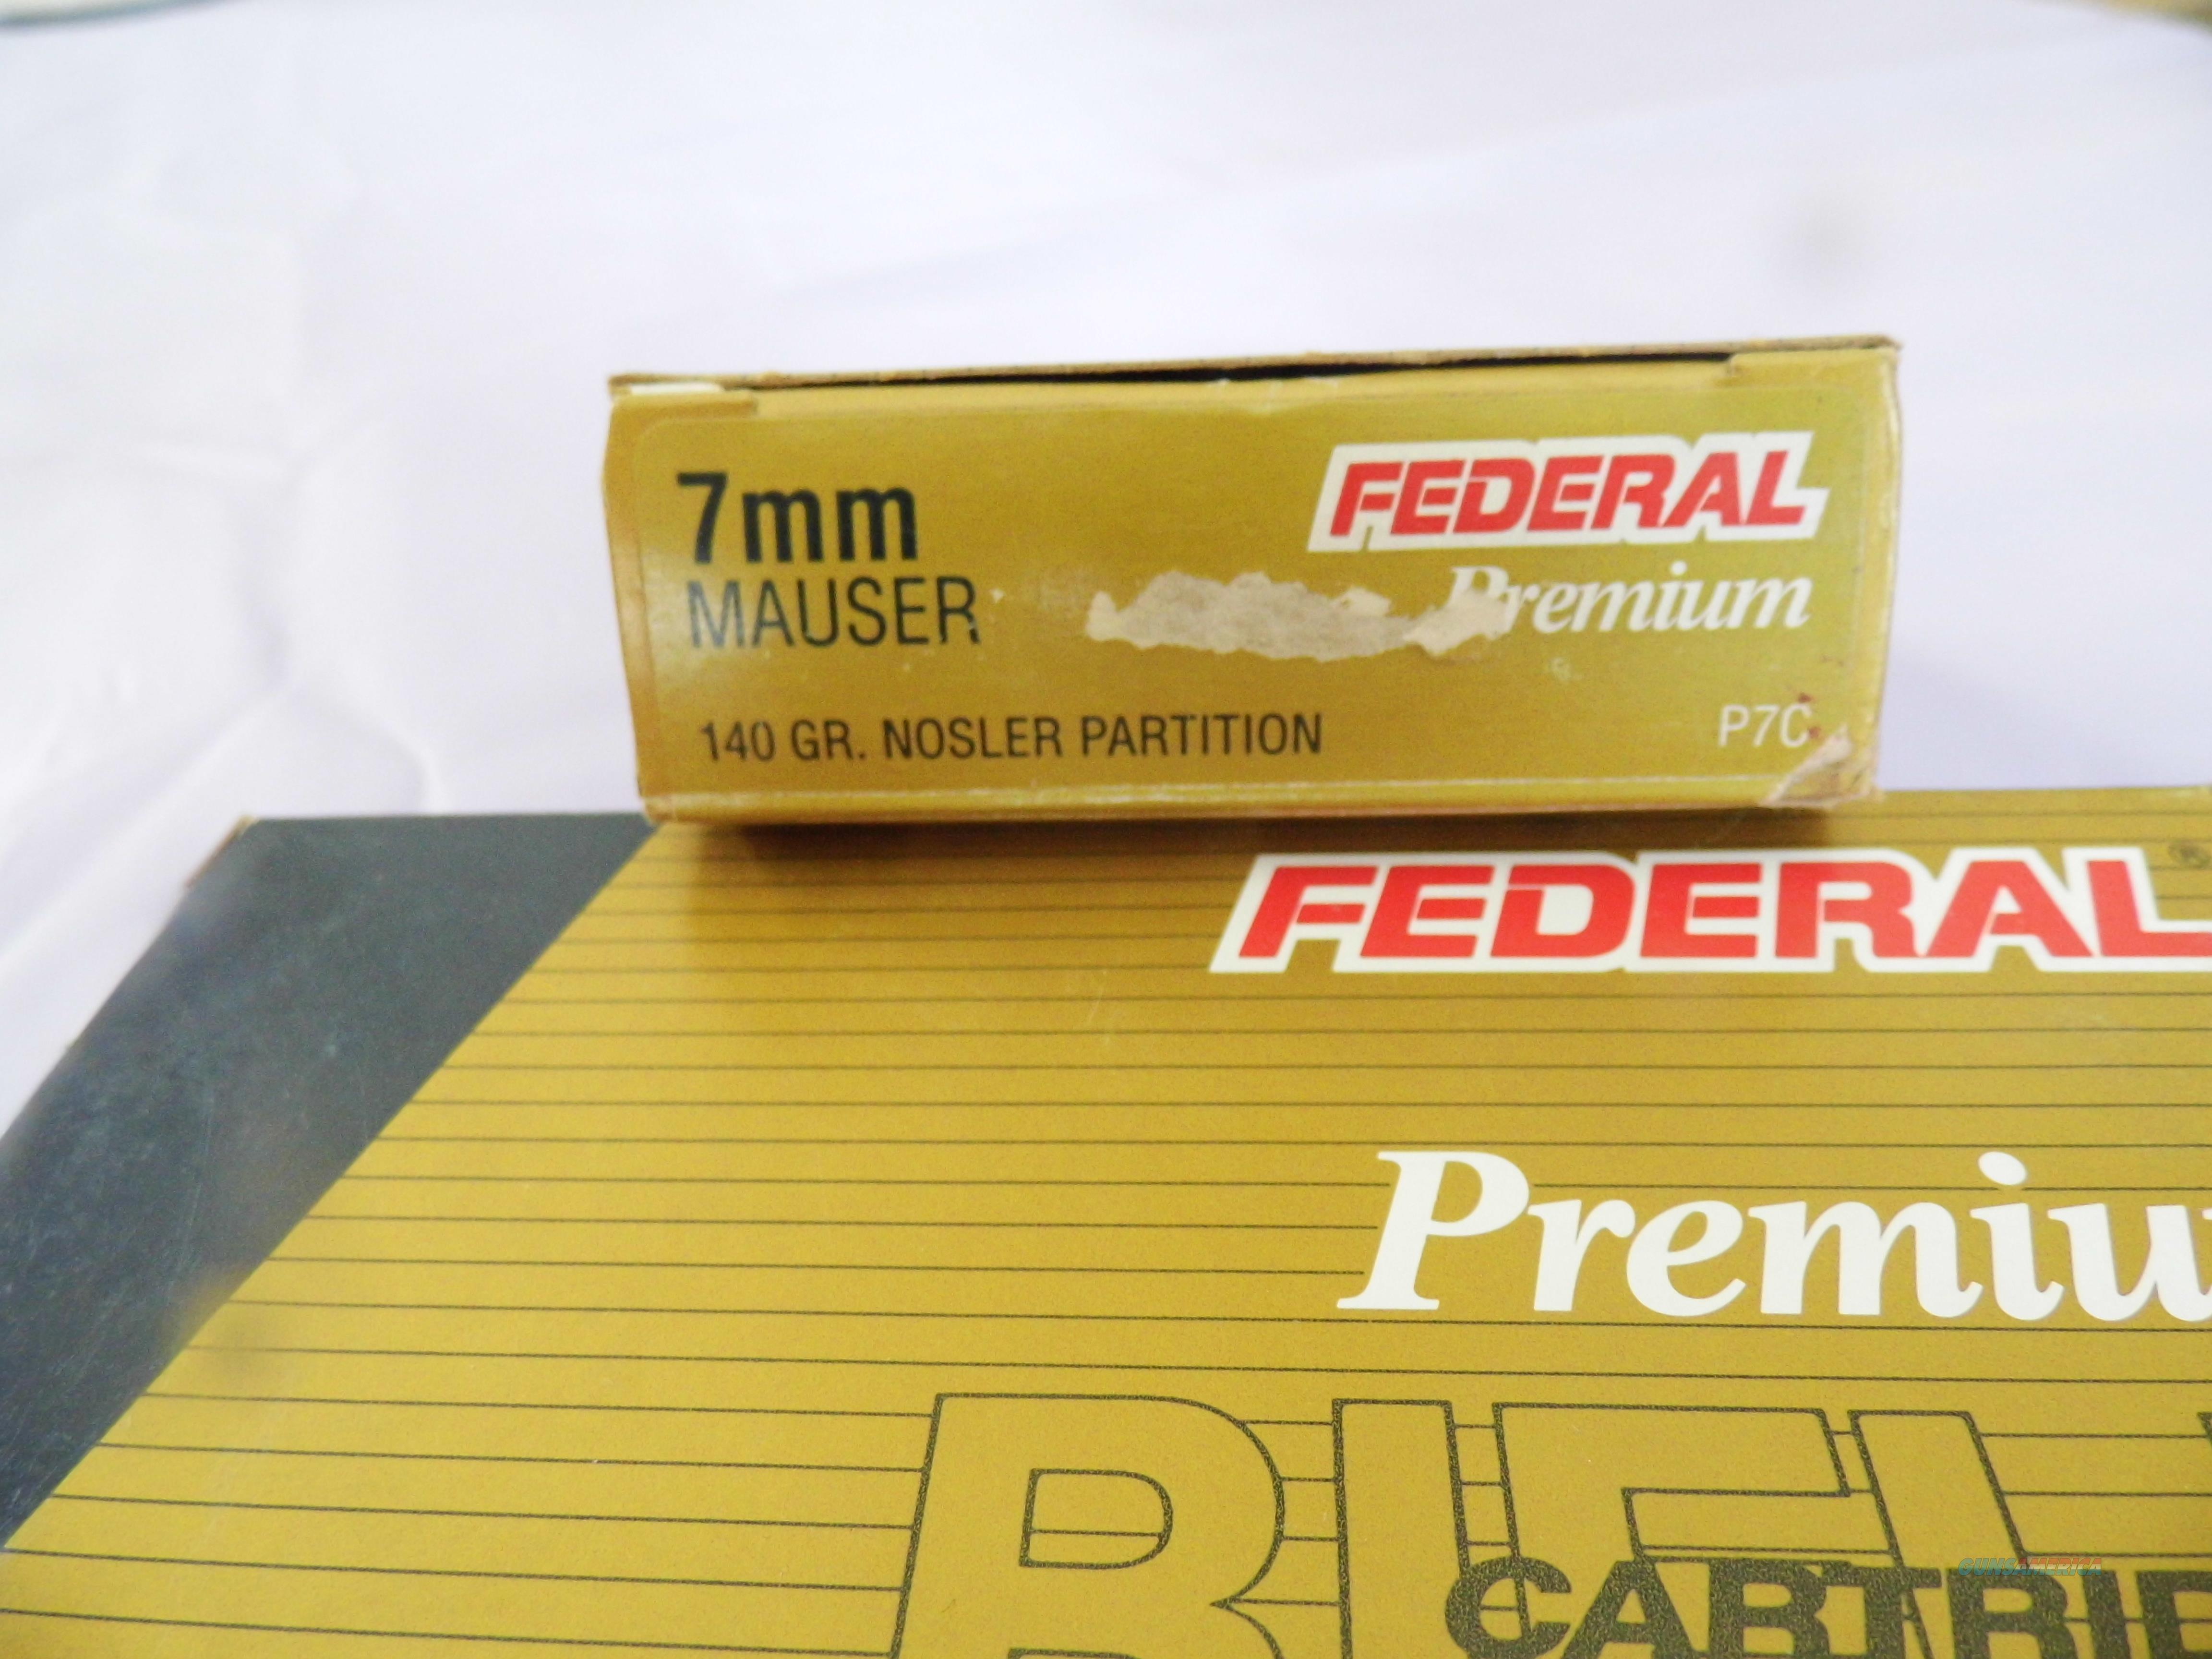 Federal Prmium 7 mm Rem. Mag. 150 Grain, Ballistic Tip, Two Boxes minus one round, 39 rounds total  Non-Guns > Ammunition